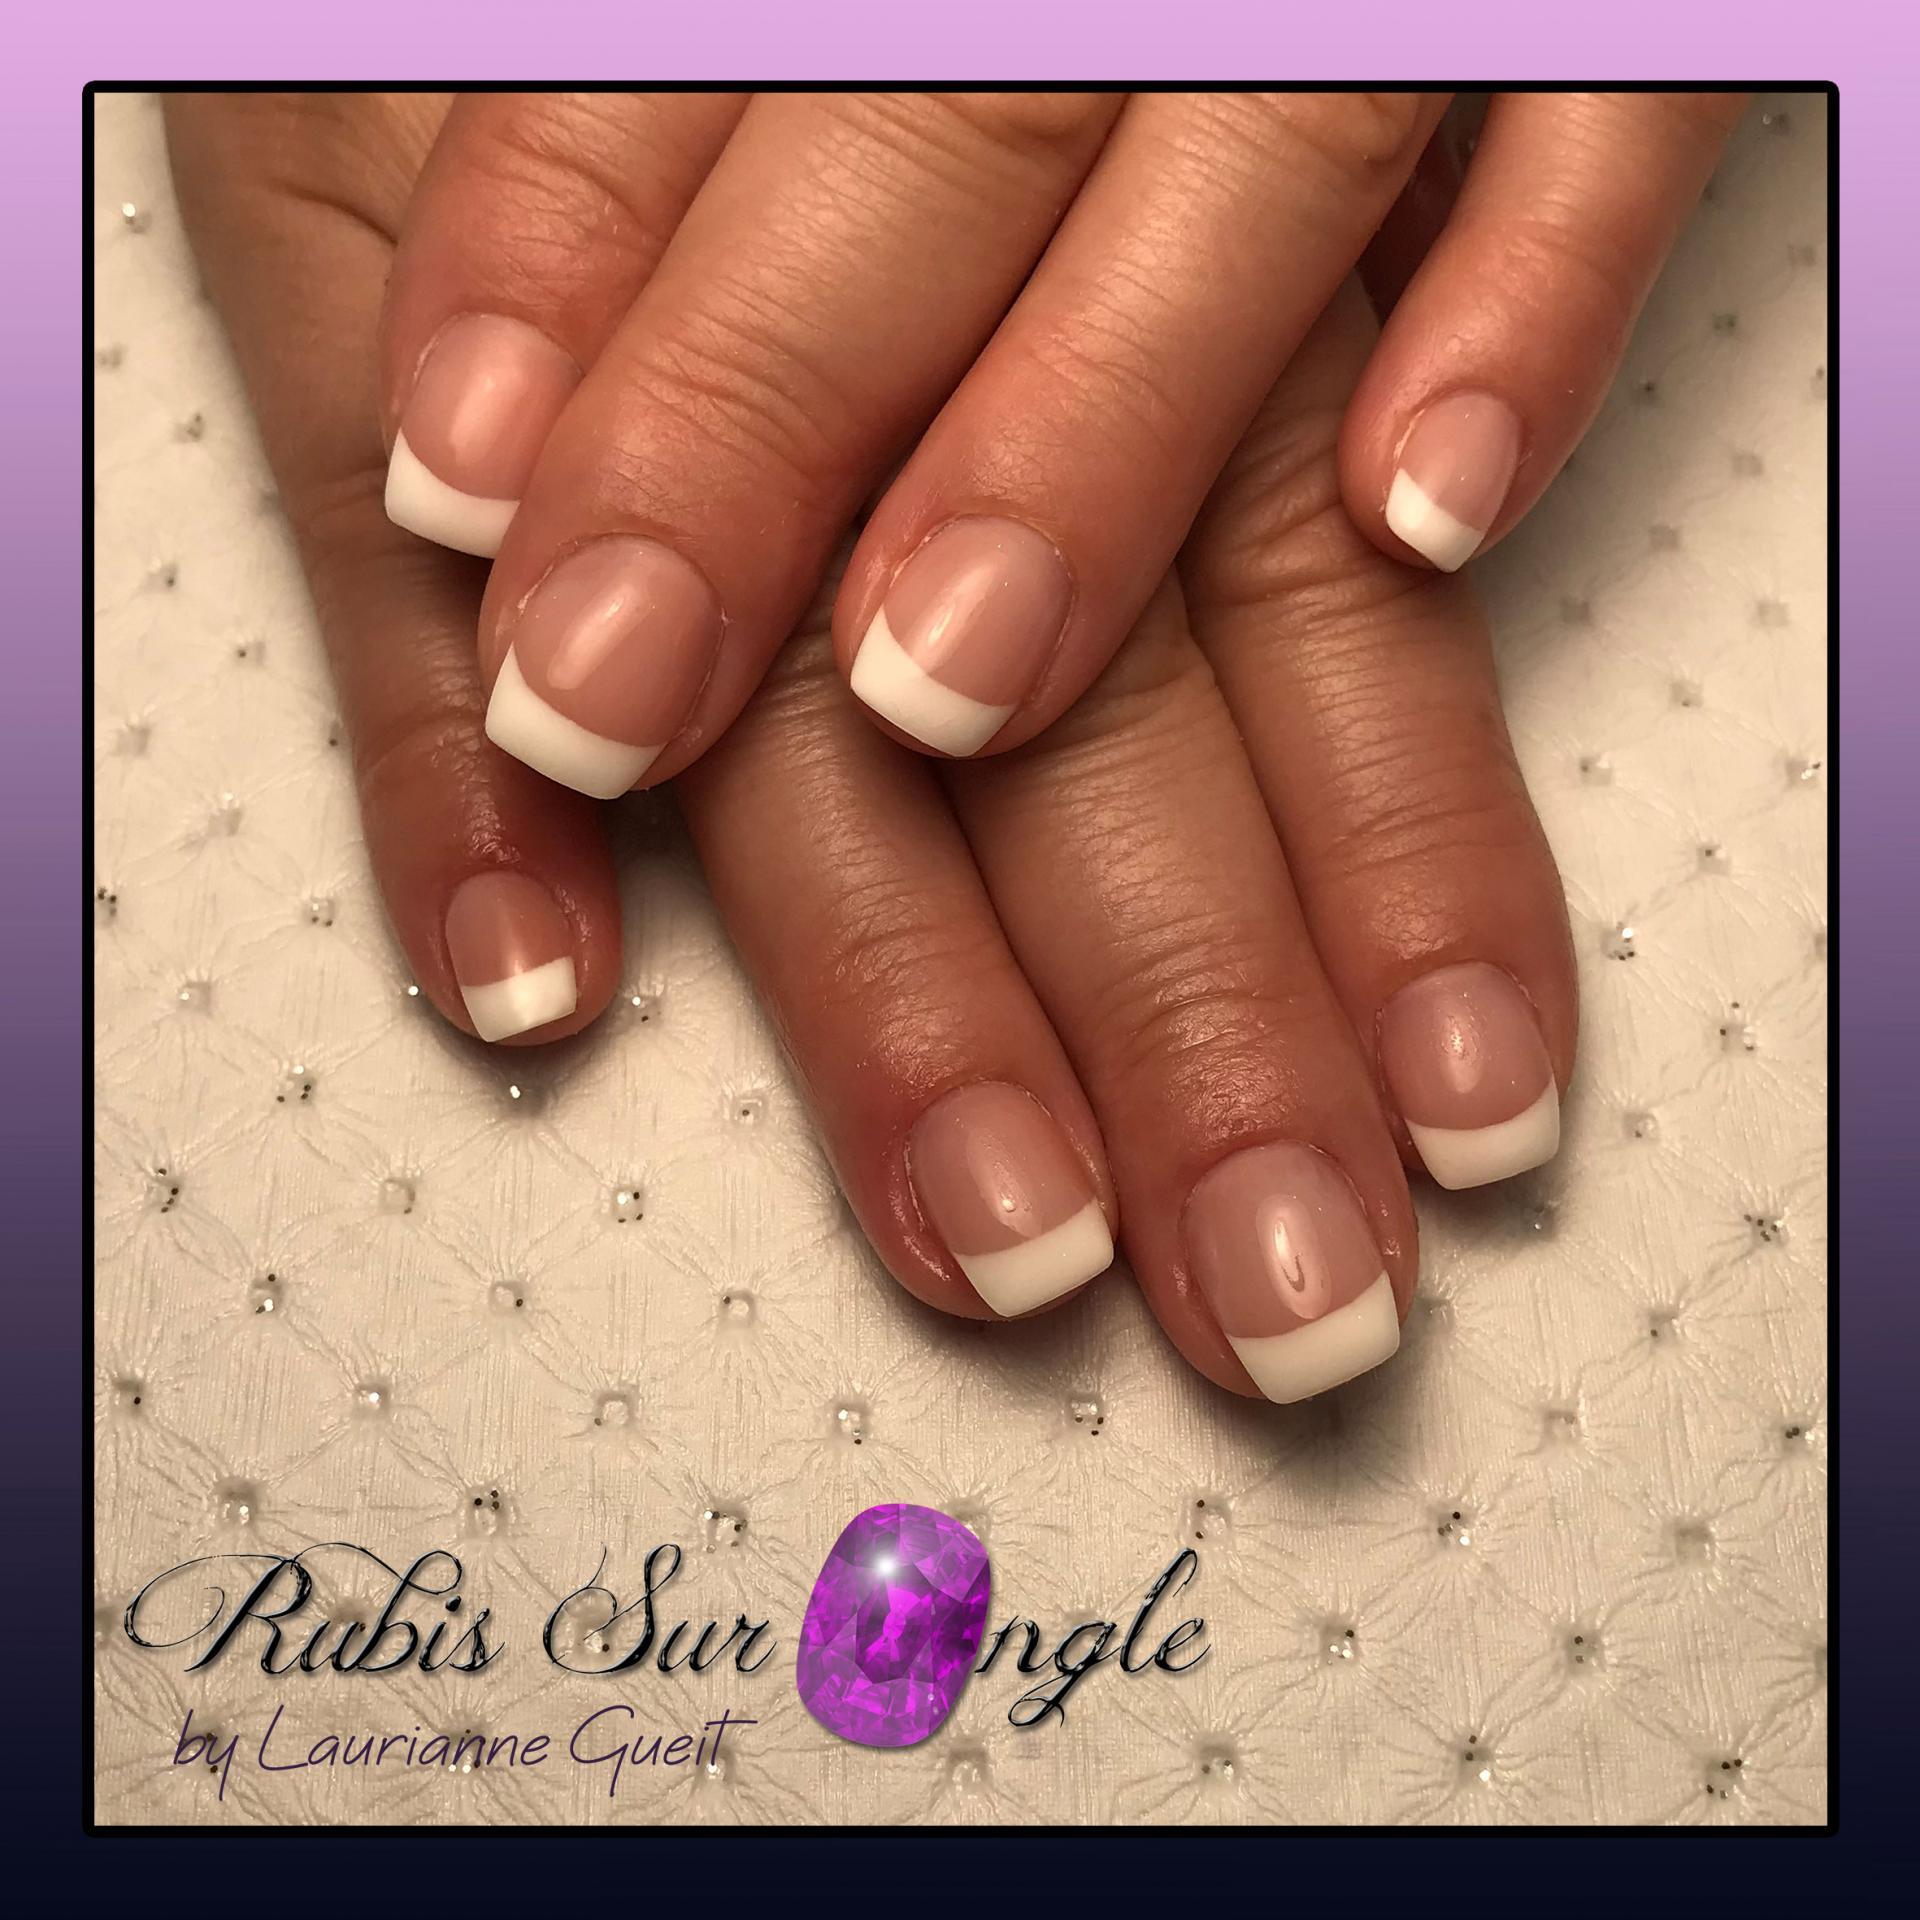 Rubis Sur Ongle Nail Art French